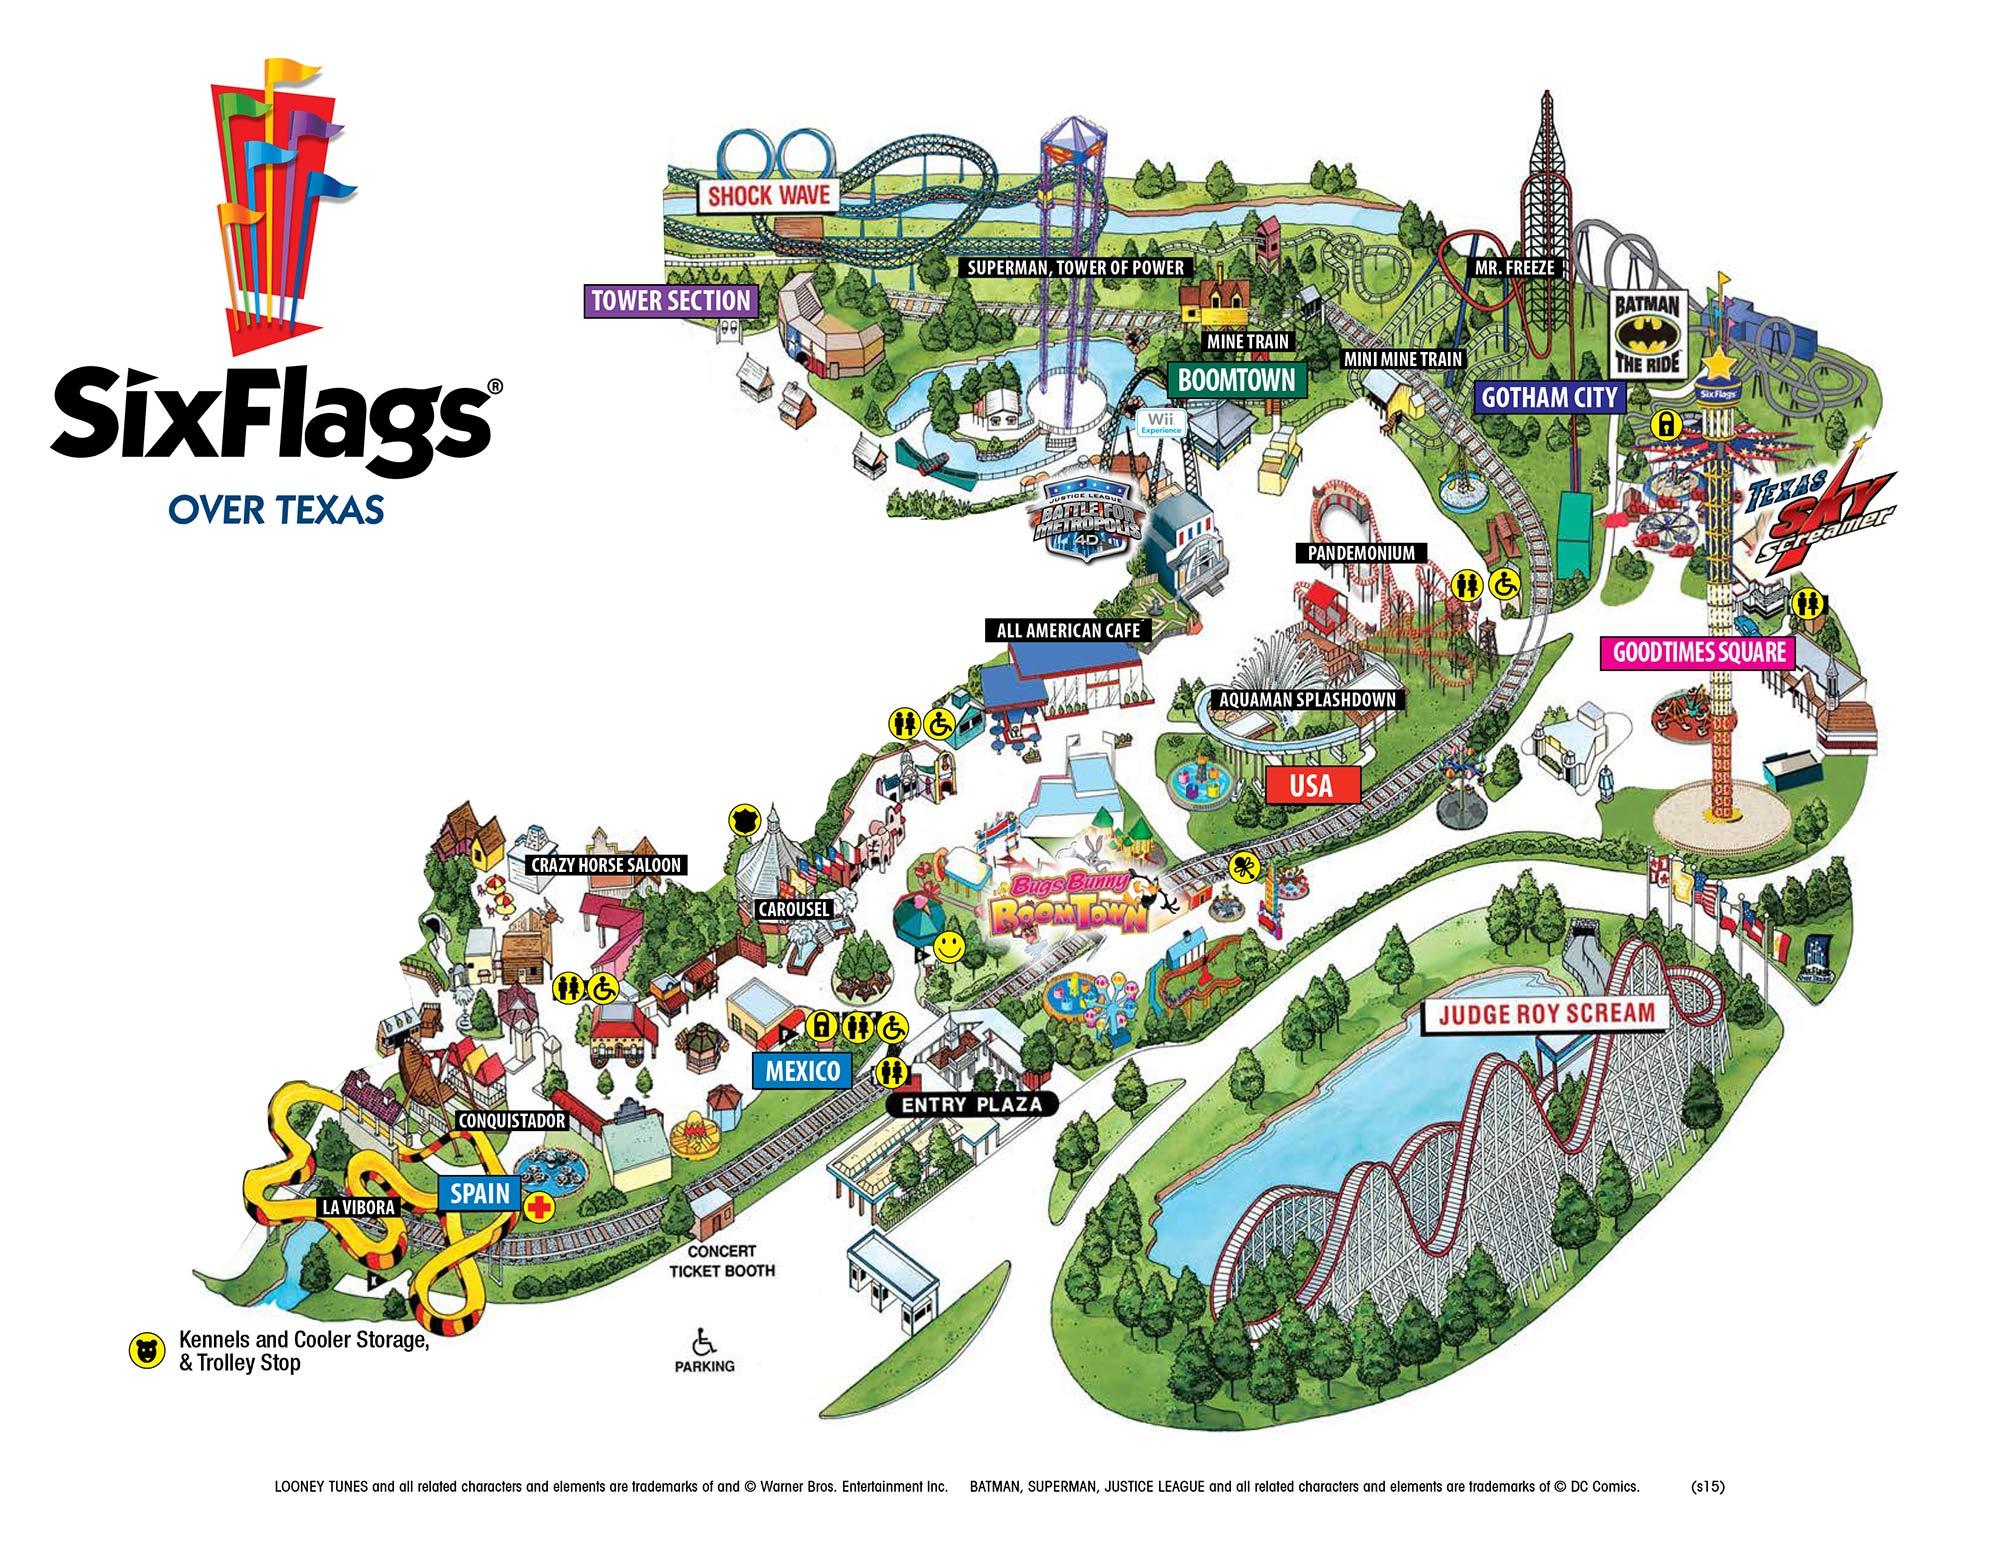 Six Flags Over Texas Map | Sitedesignco - Six Flags Over Texas Map